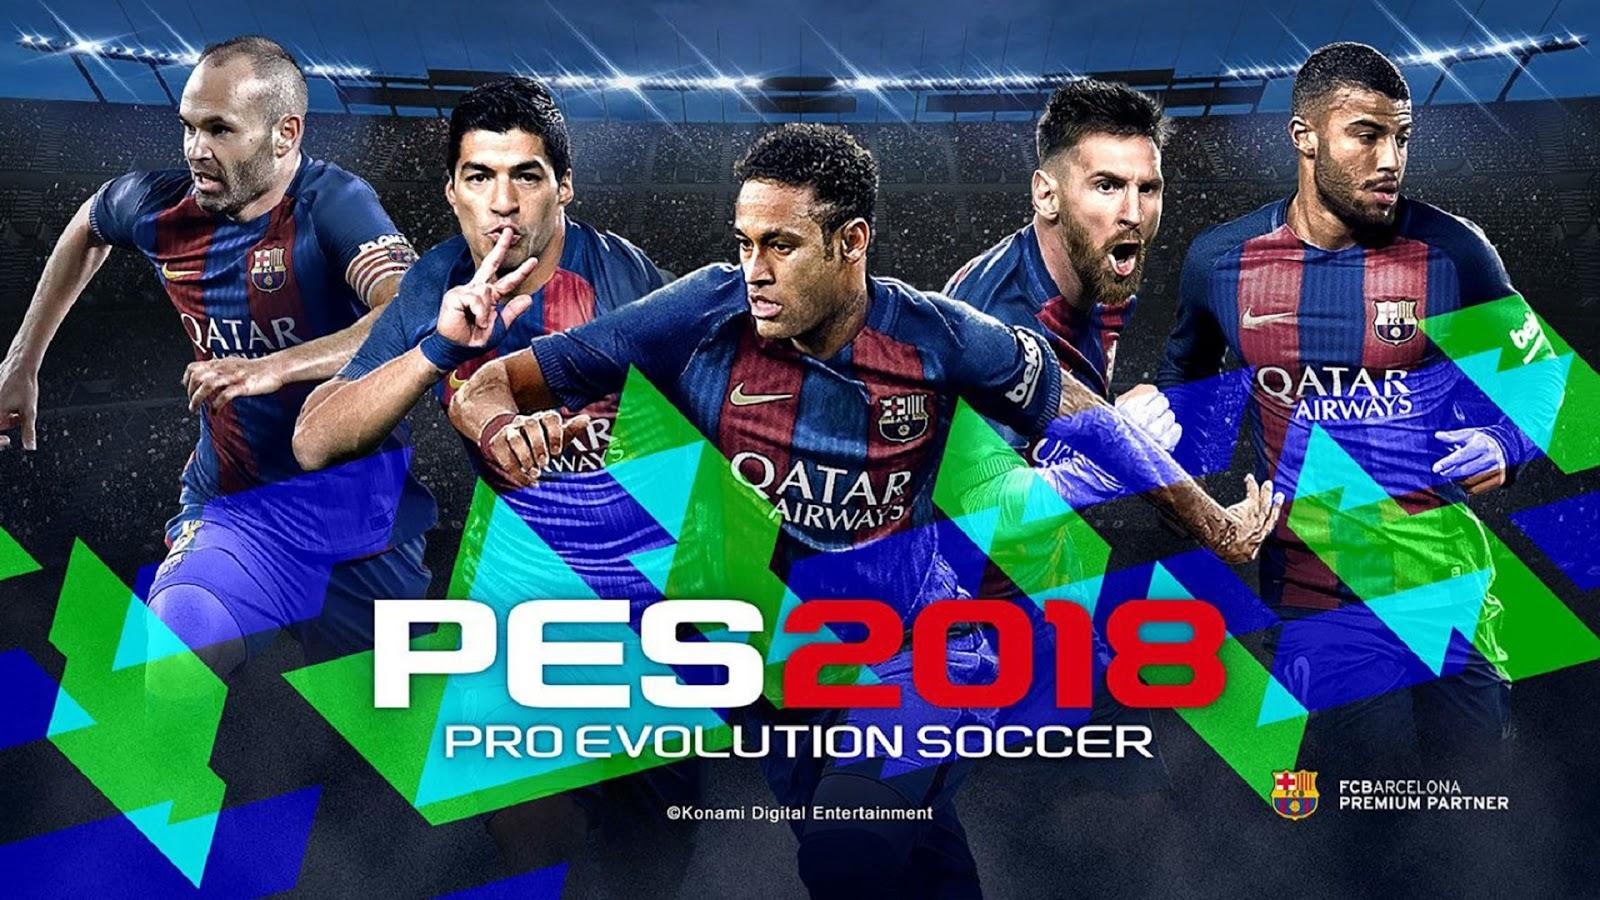 Pro Evolution Soccer (PES) 2018 Wallpapers